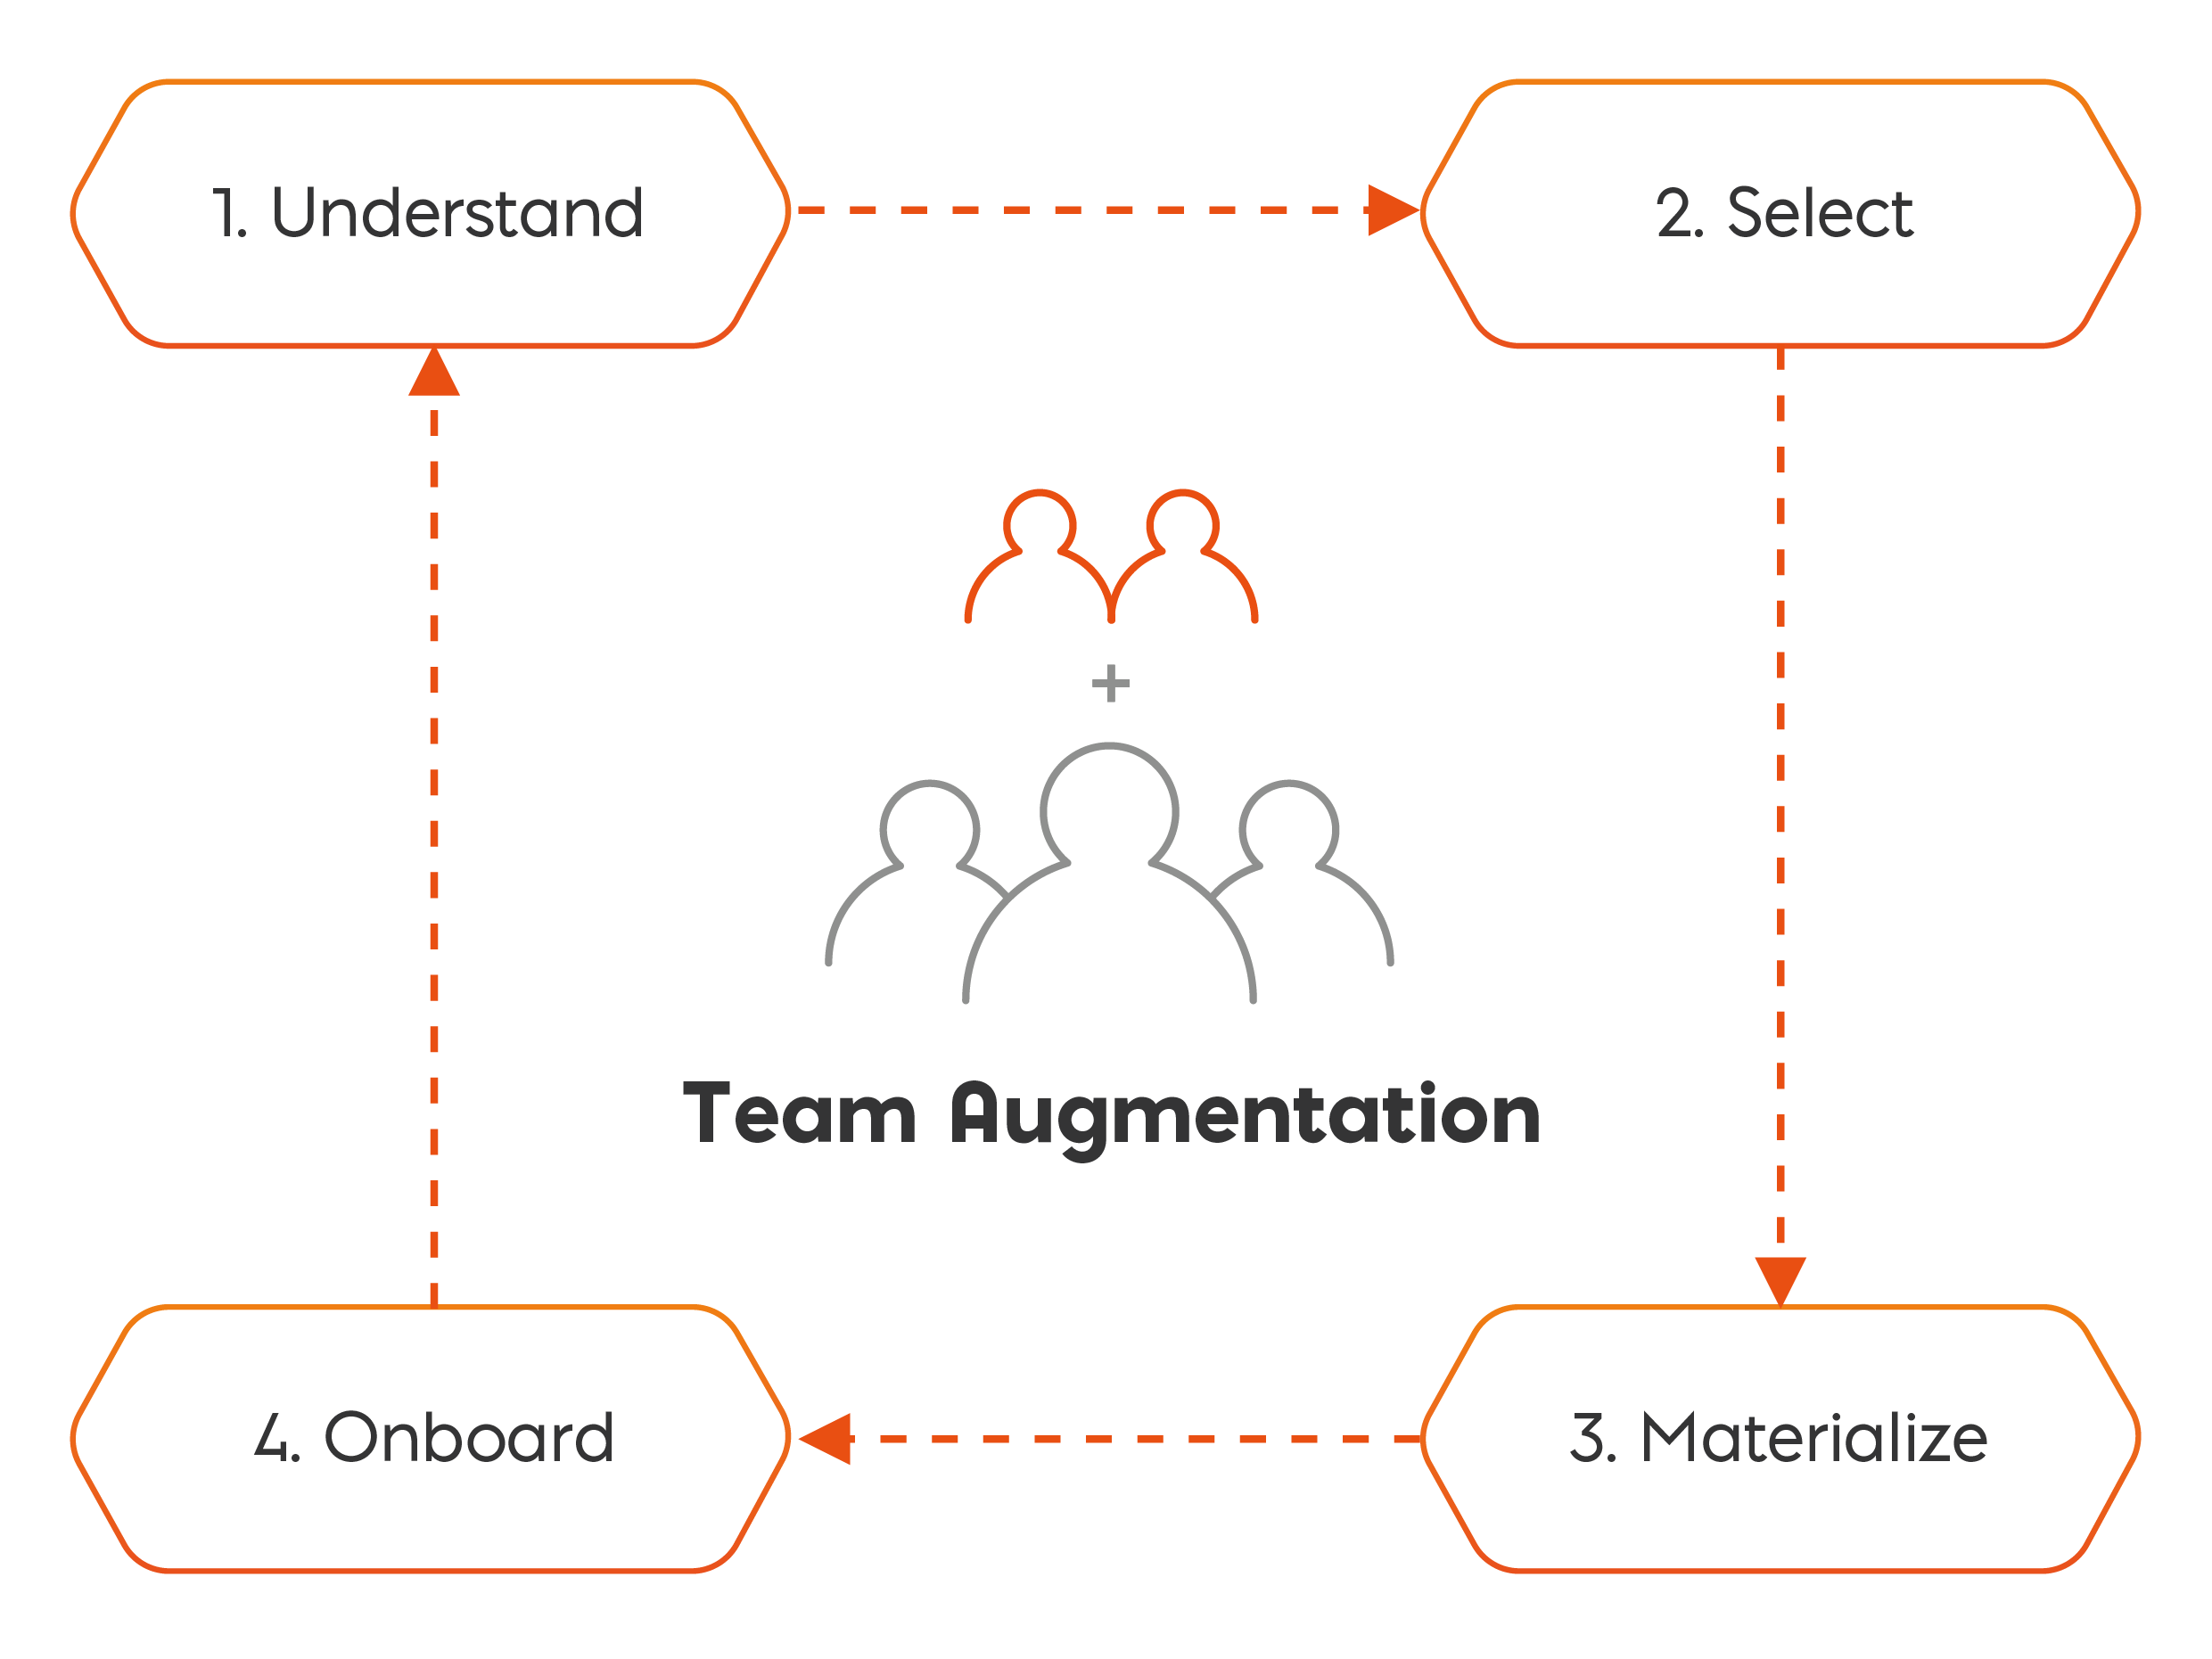 Staff Augmentation process